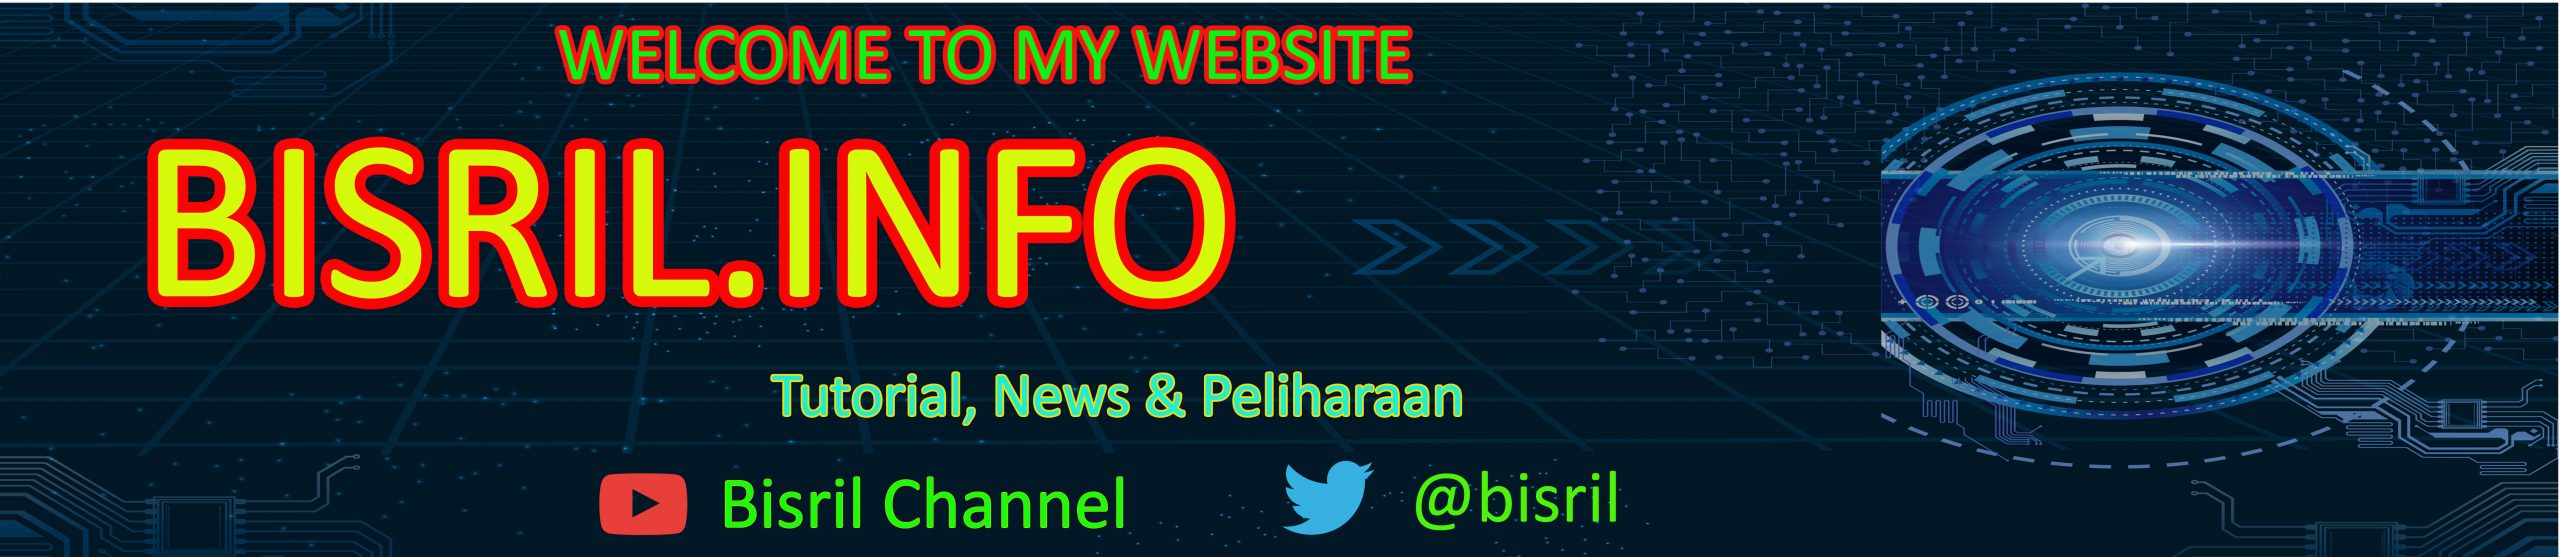 bisril.info